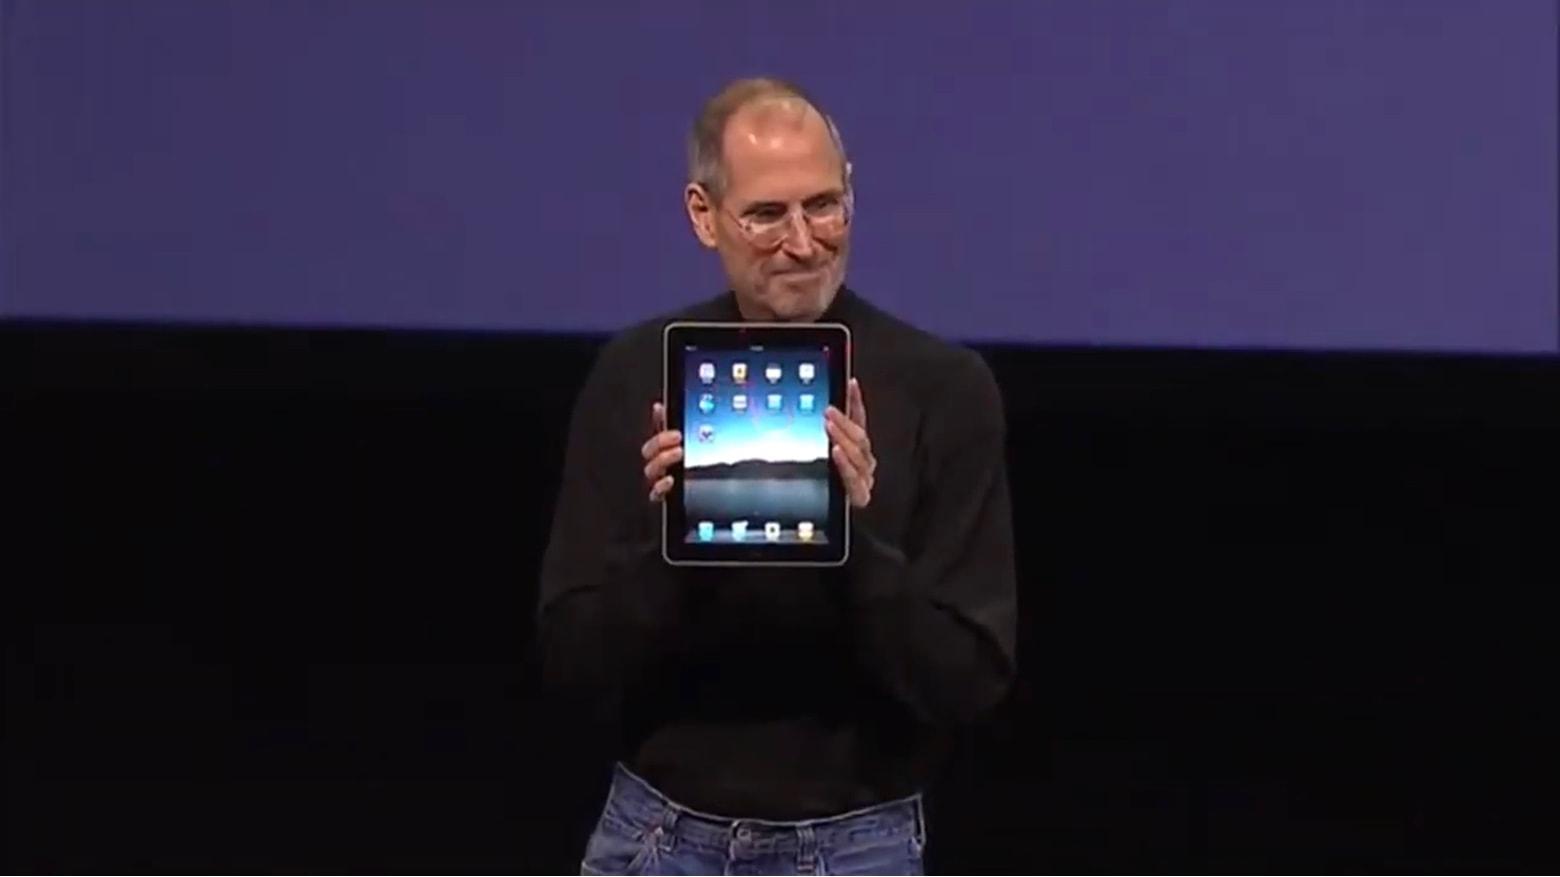 Steve Jobs with the original iPad